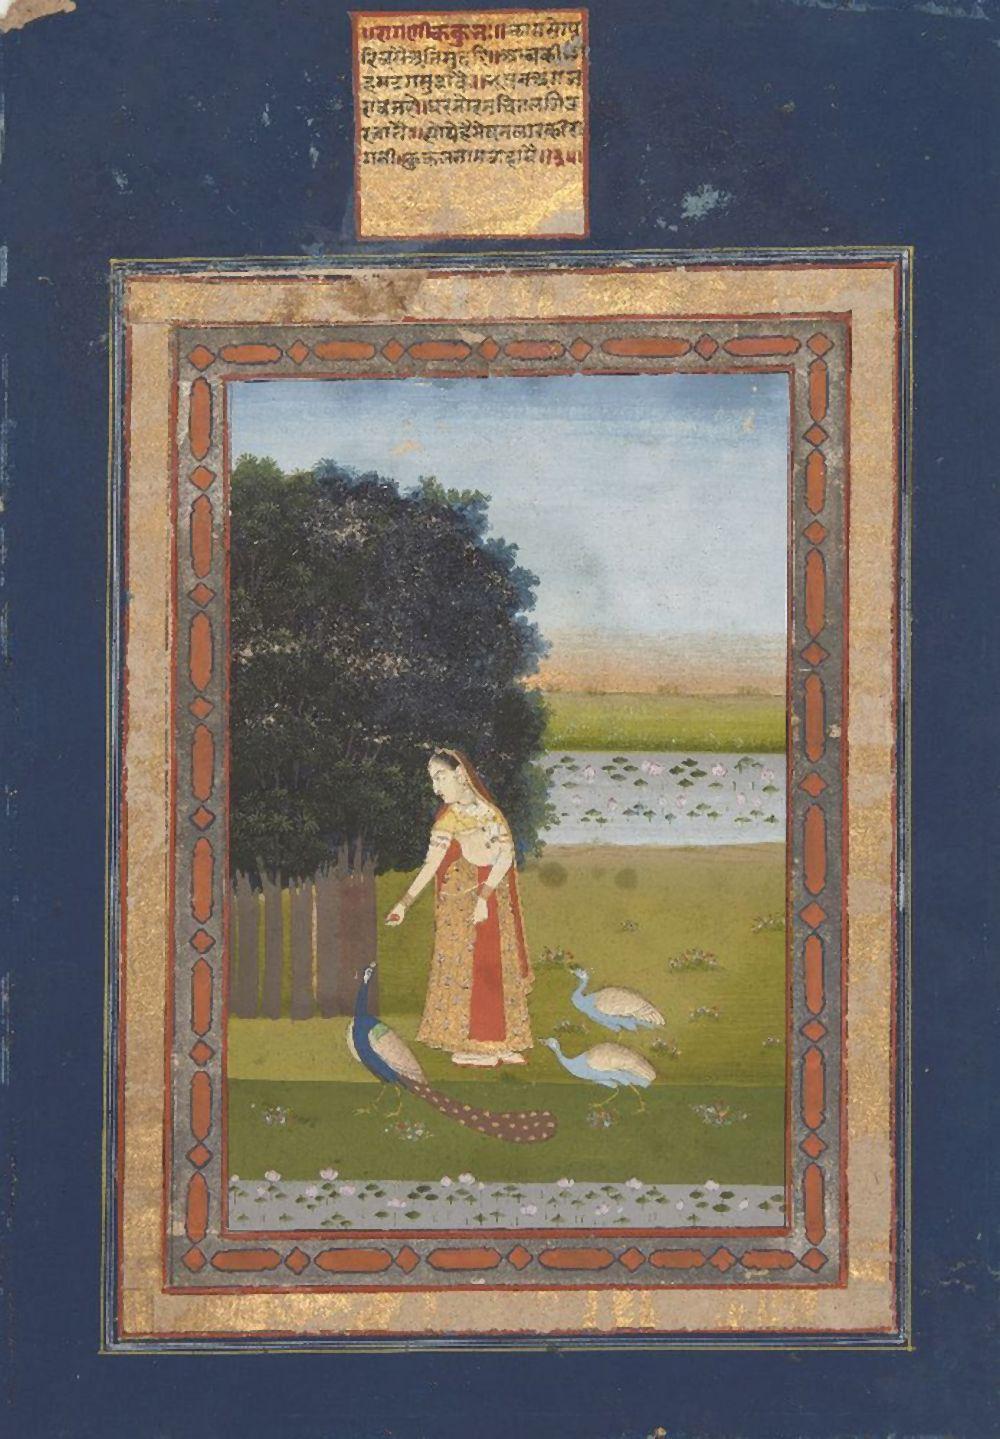 An illustration from a Ragamala Series: Kakubha Ragini, Jaipur, Rajasthan,